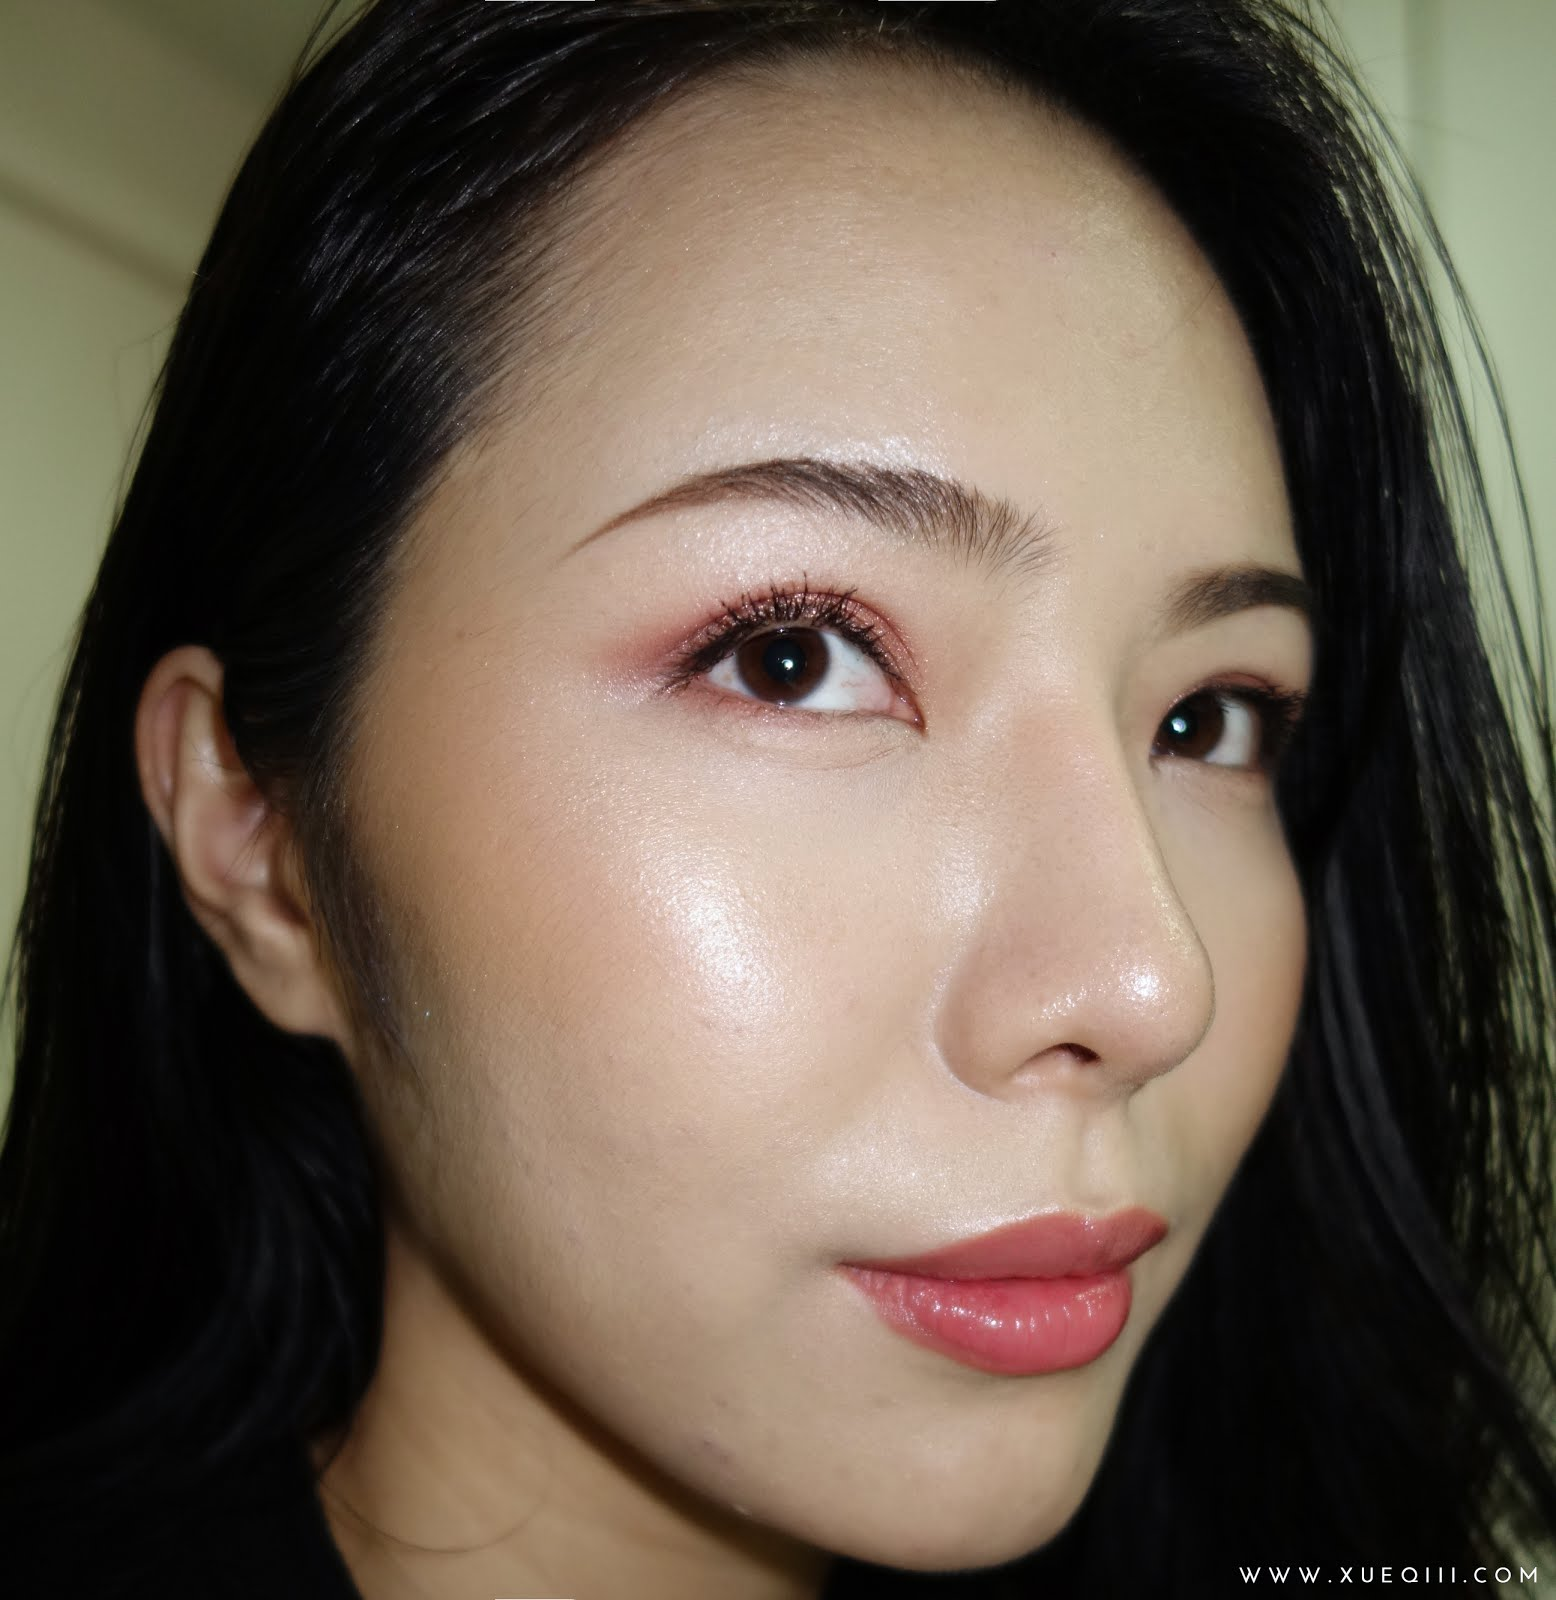 silk skin ipl reviews